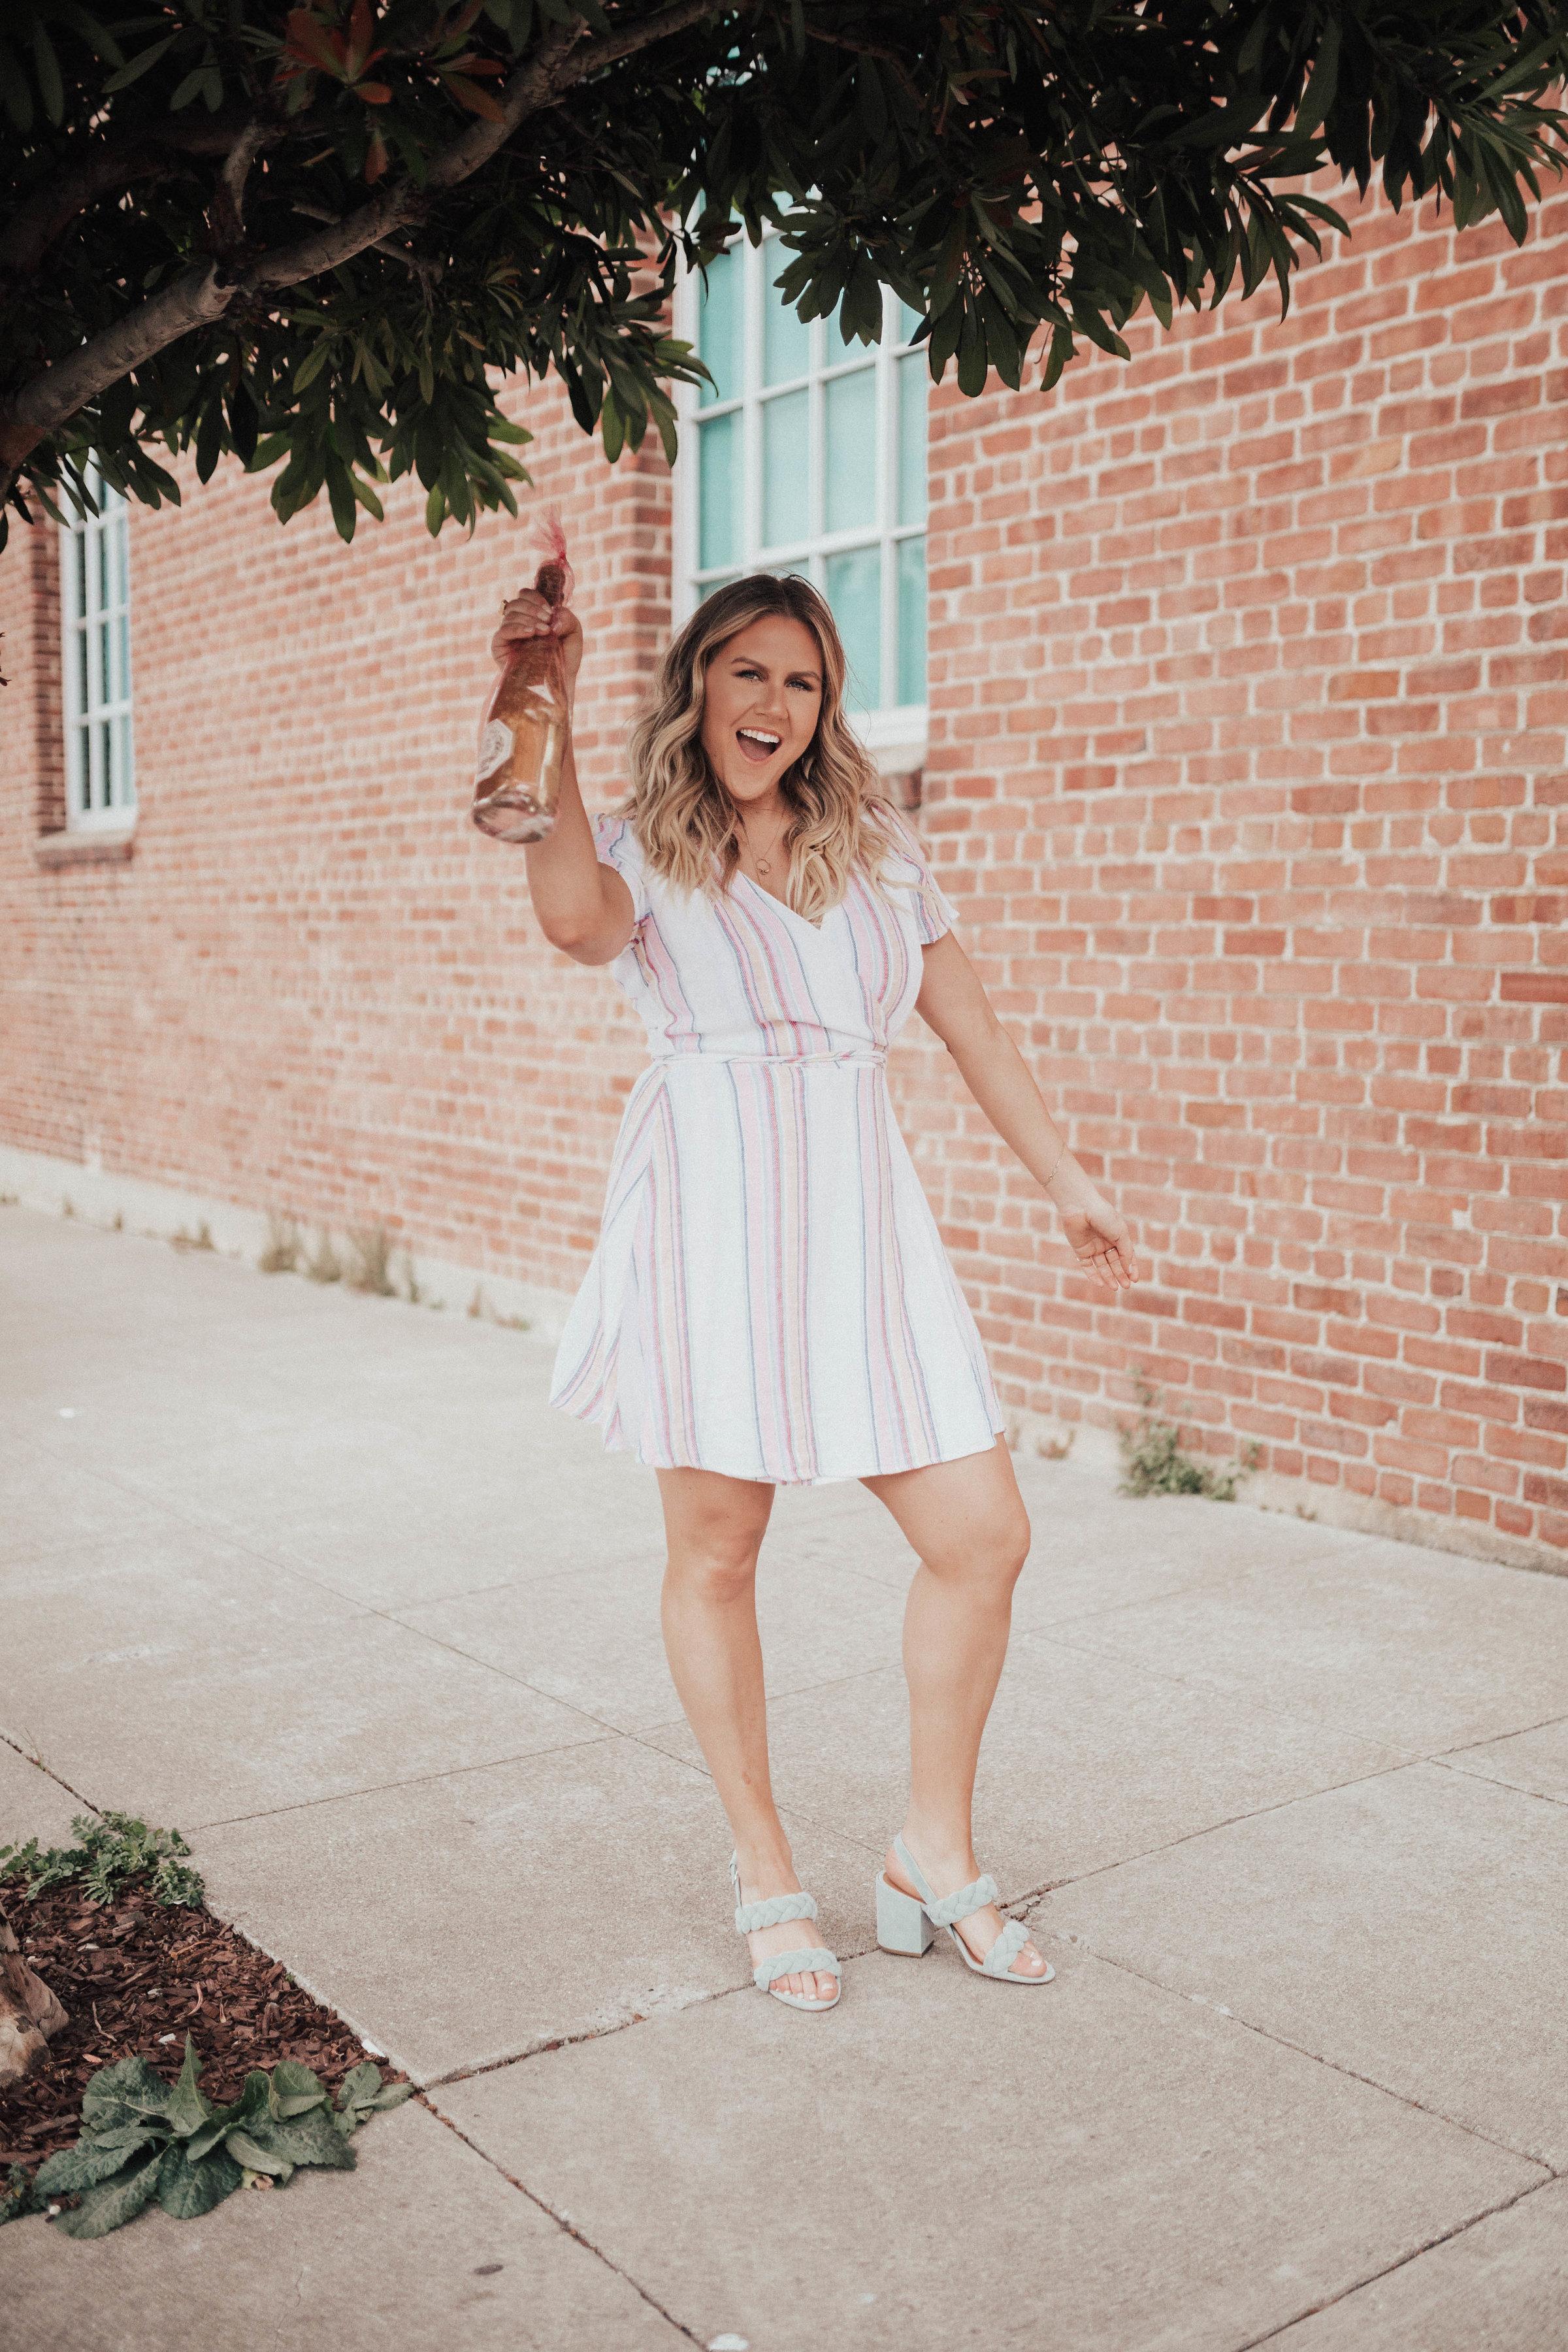 via Thea Forever21 Dress, Rebecca Minkoff heels, Sophia Sparkling Wine